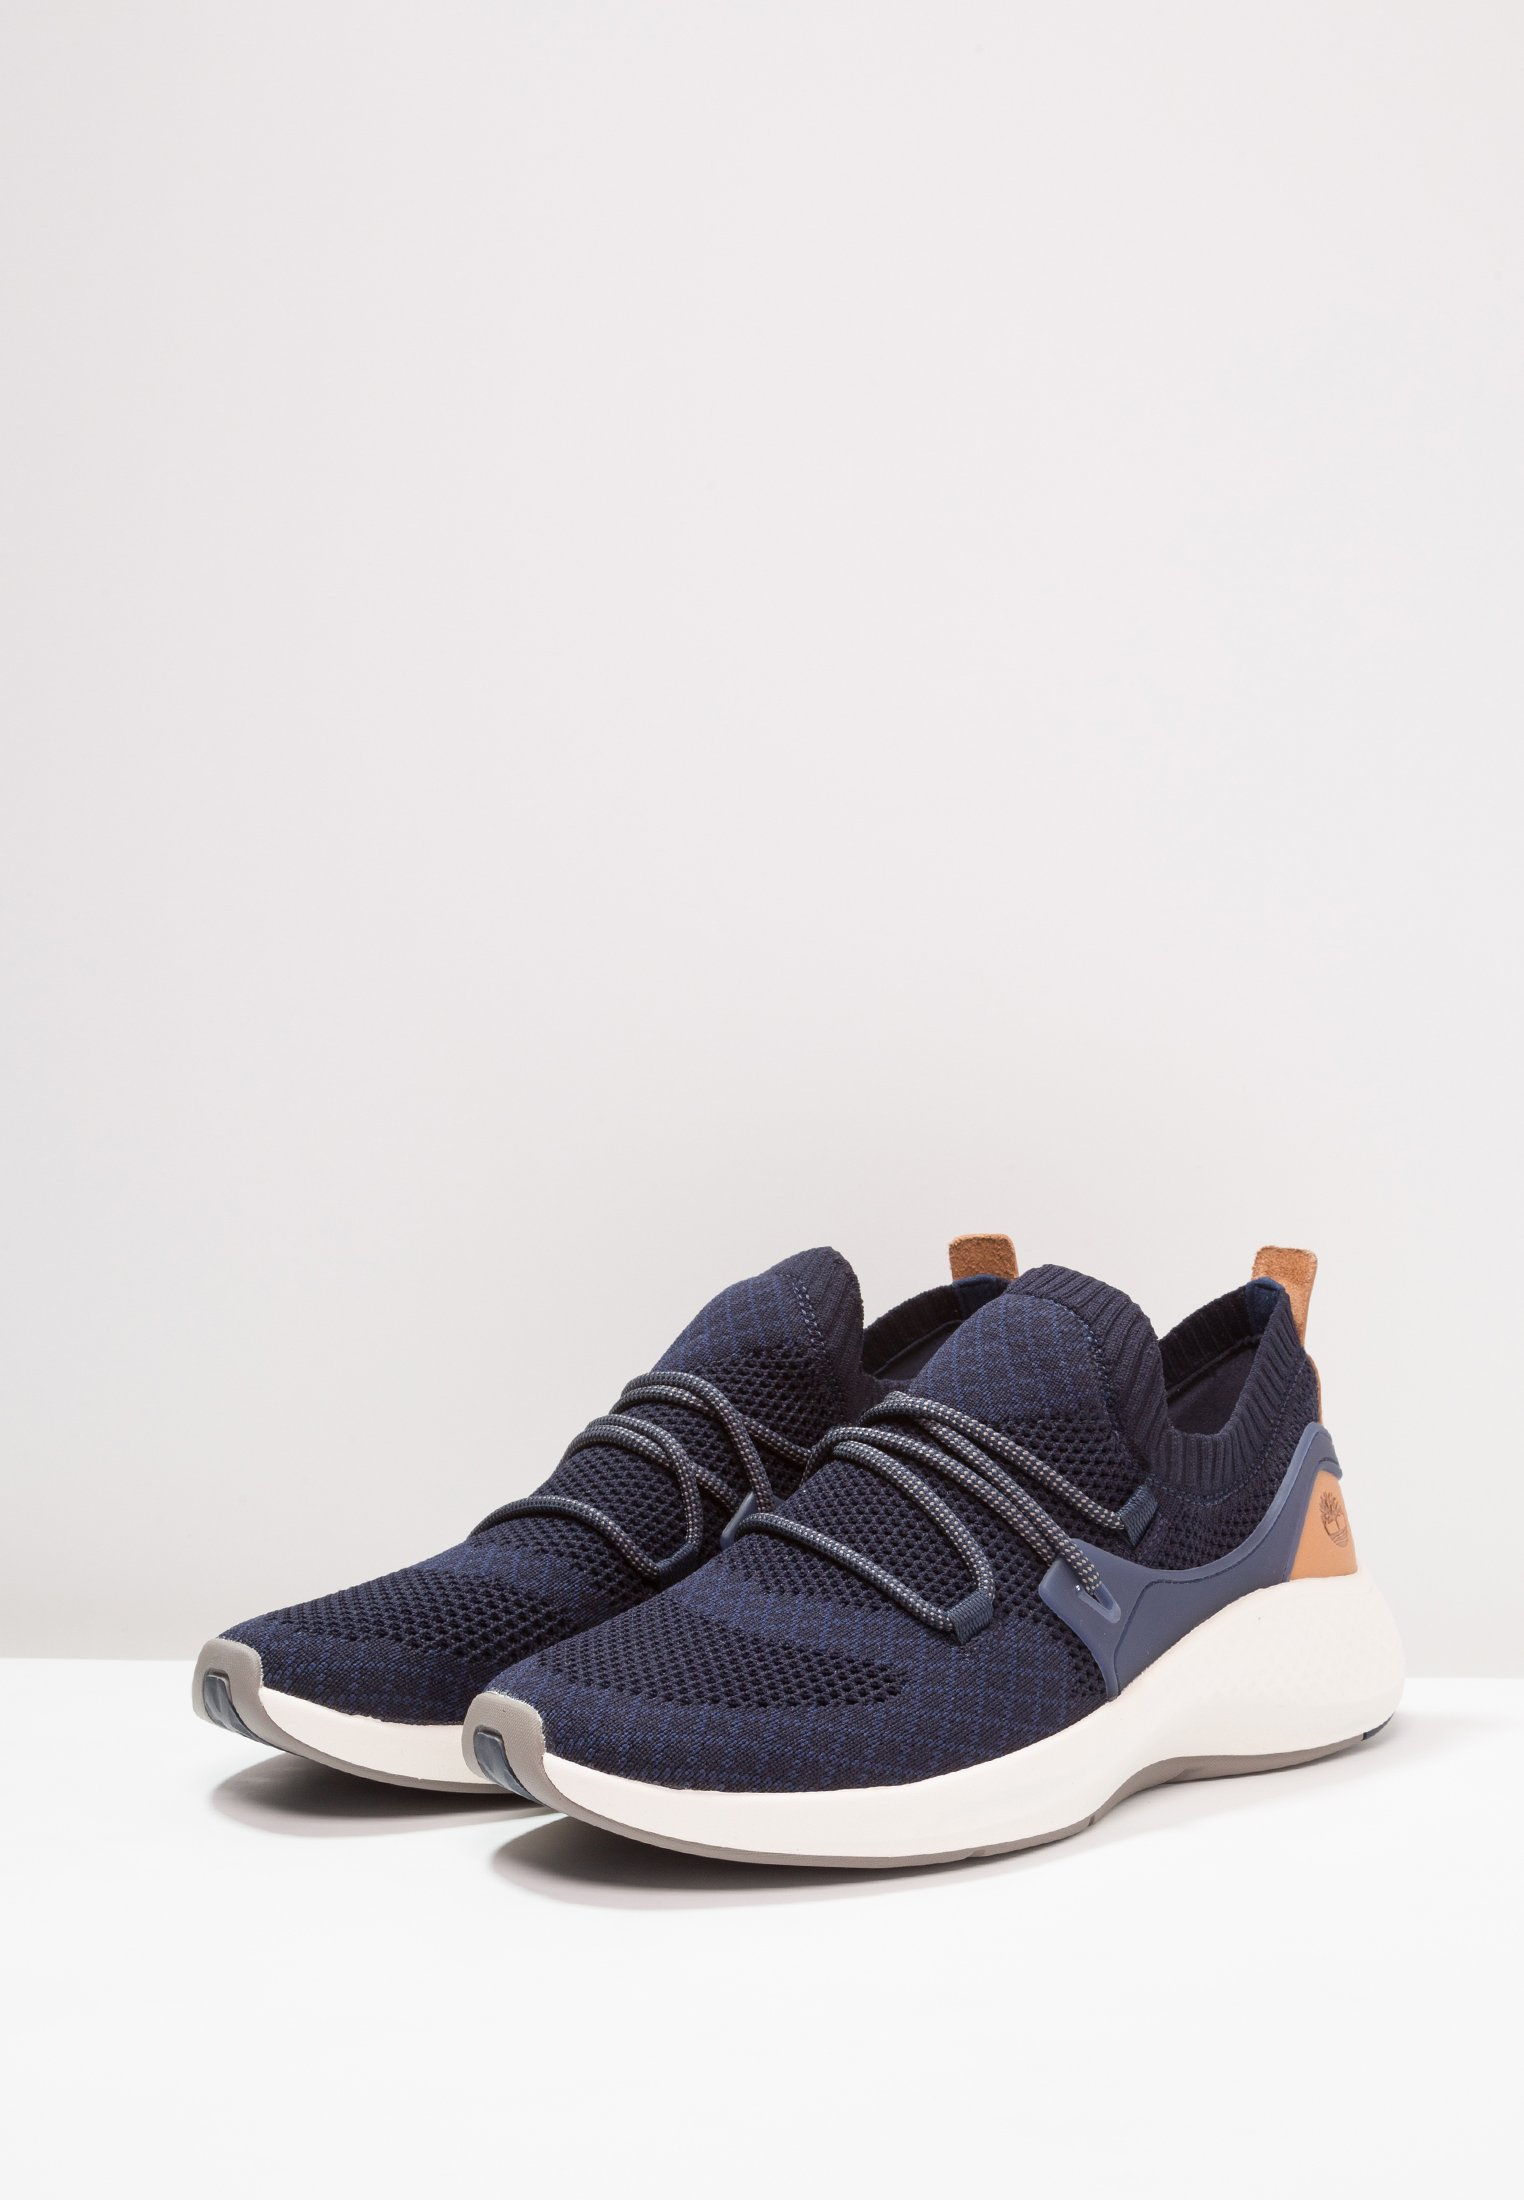 Timberland Flyroam Go Knit Oxford - Baskets Basses Black Iris